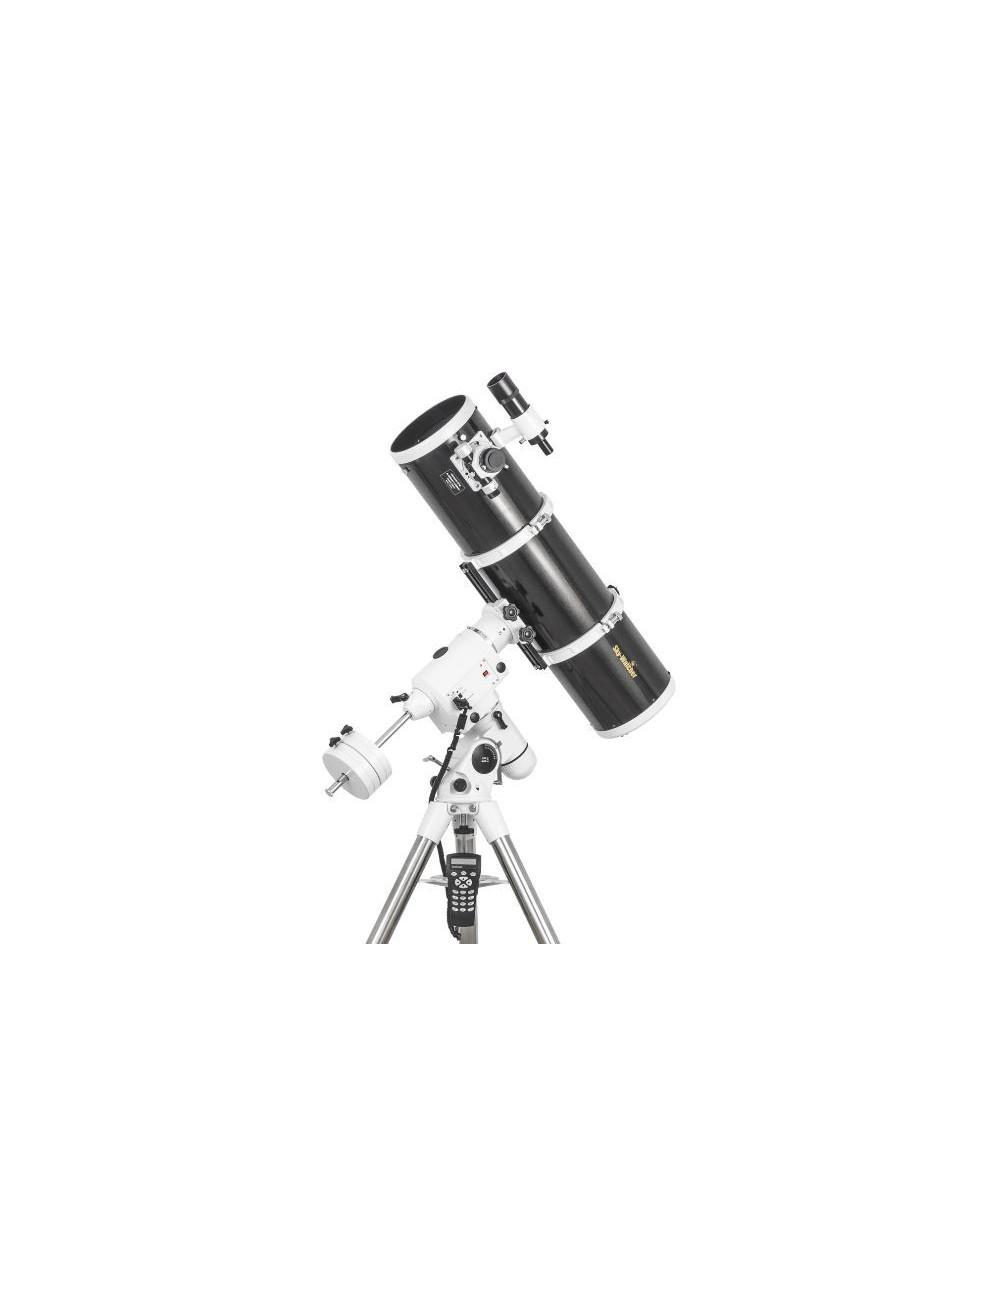 Télescope Sky-Watcher 200/1000 Dual Speed sur NEQ6 Pro Go-To BD